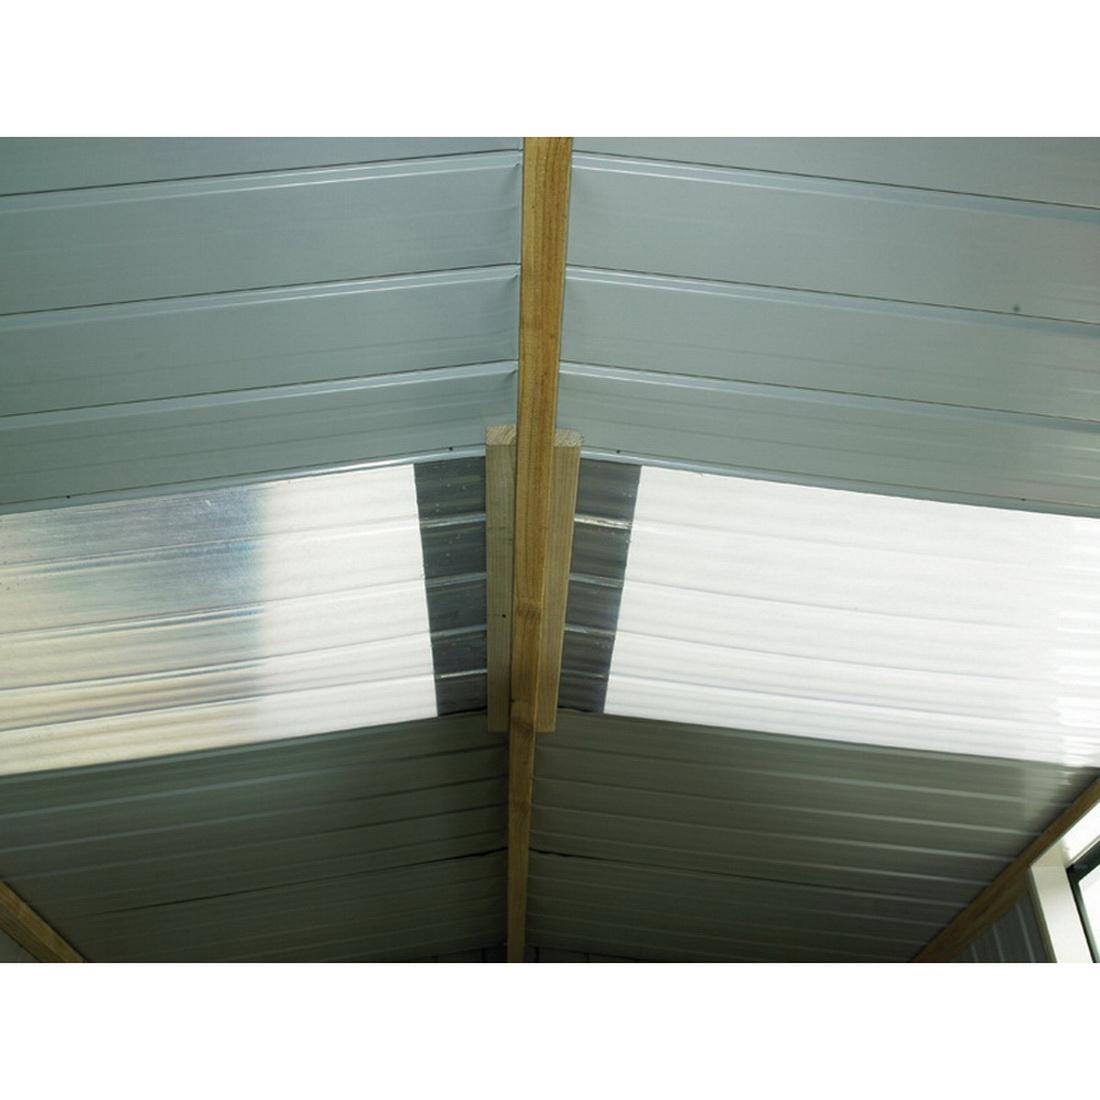 Kiwi Double Side Type A Clear Roof Panel Zinc KCRPAB